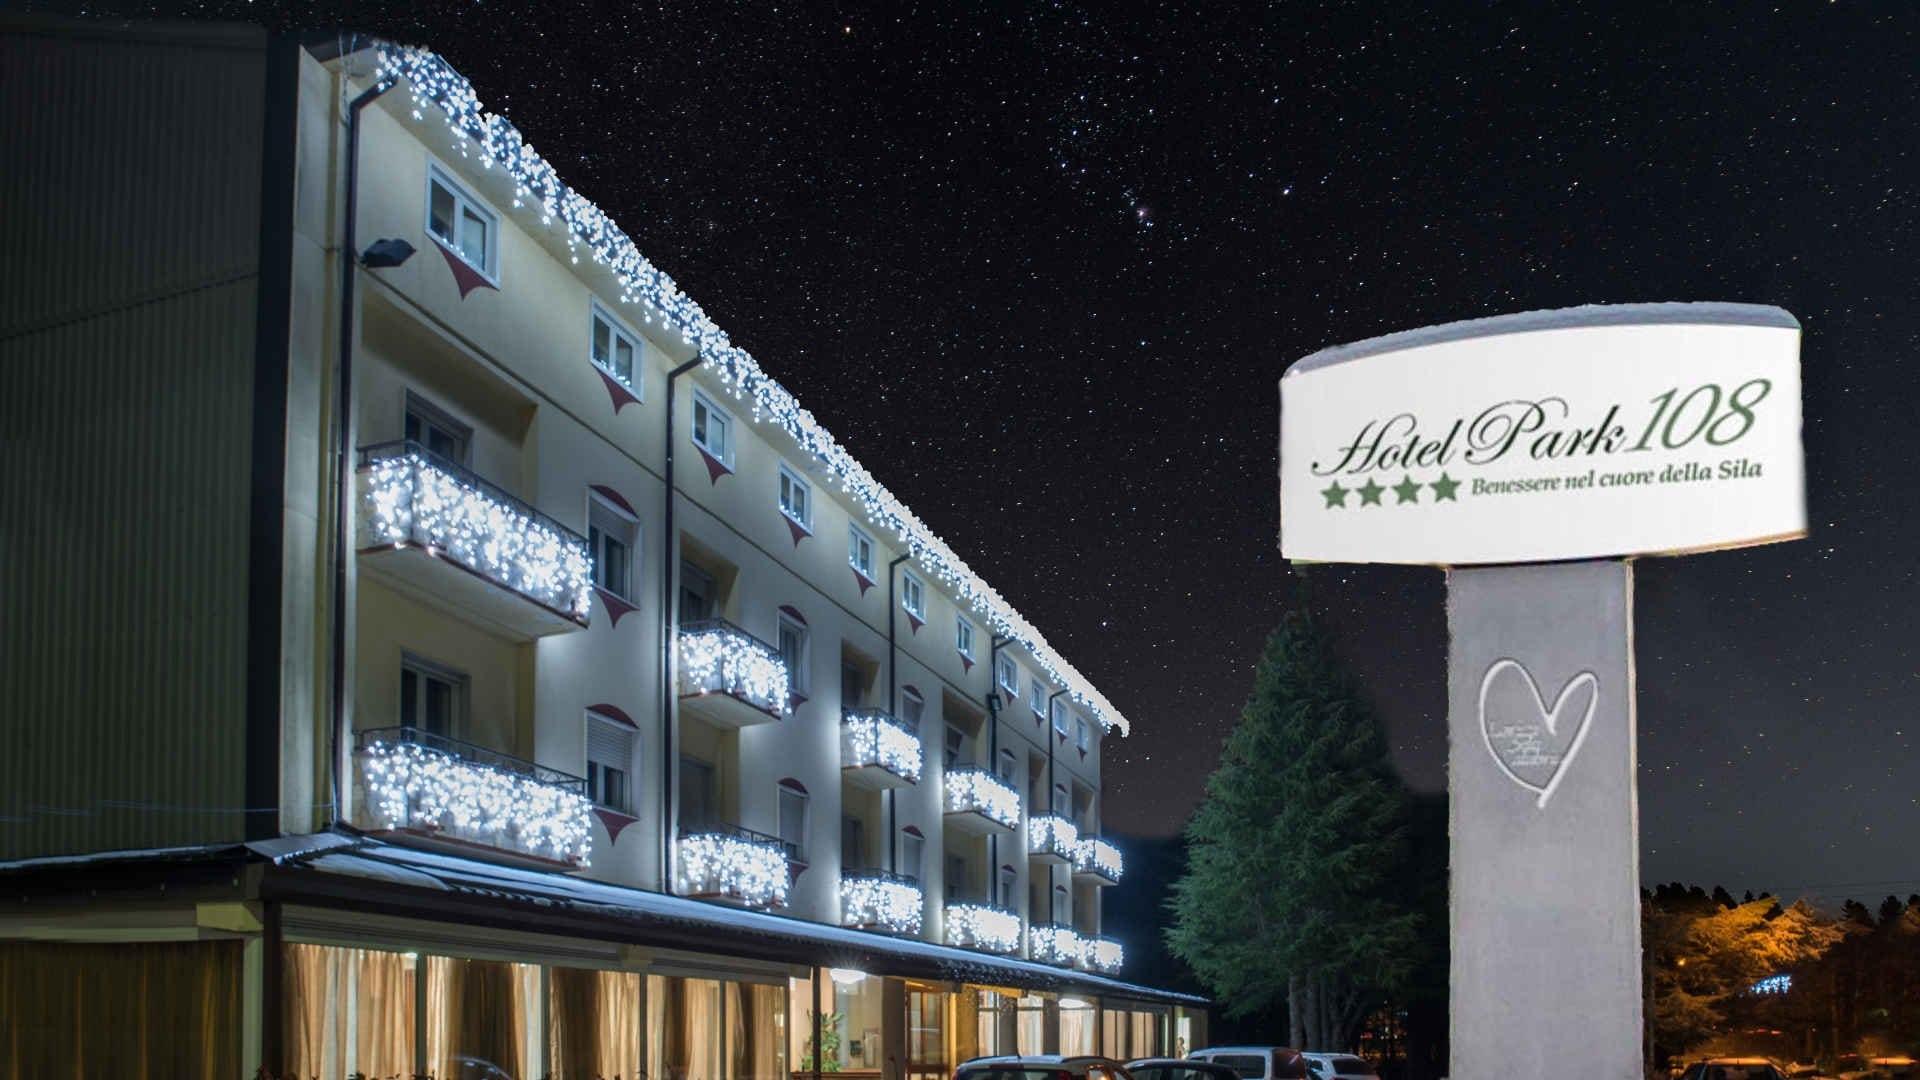 OFFERTA WEEKEND DOLCE VITA HOTEL PARK 108